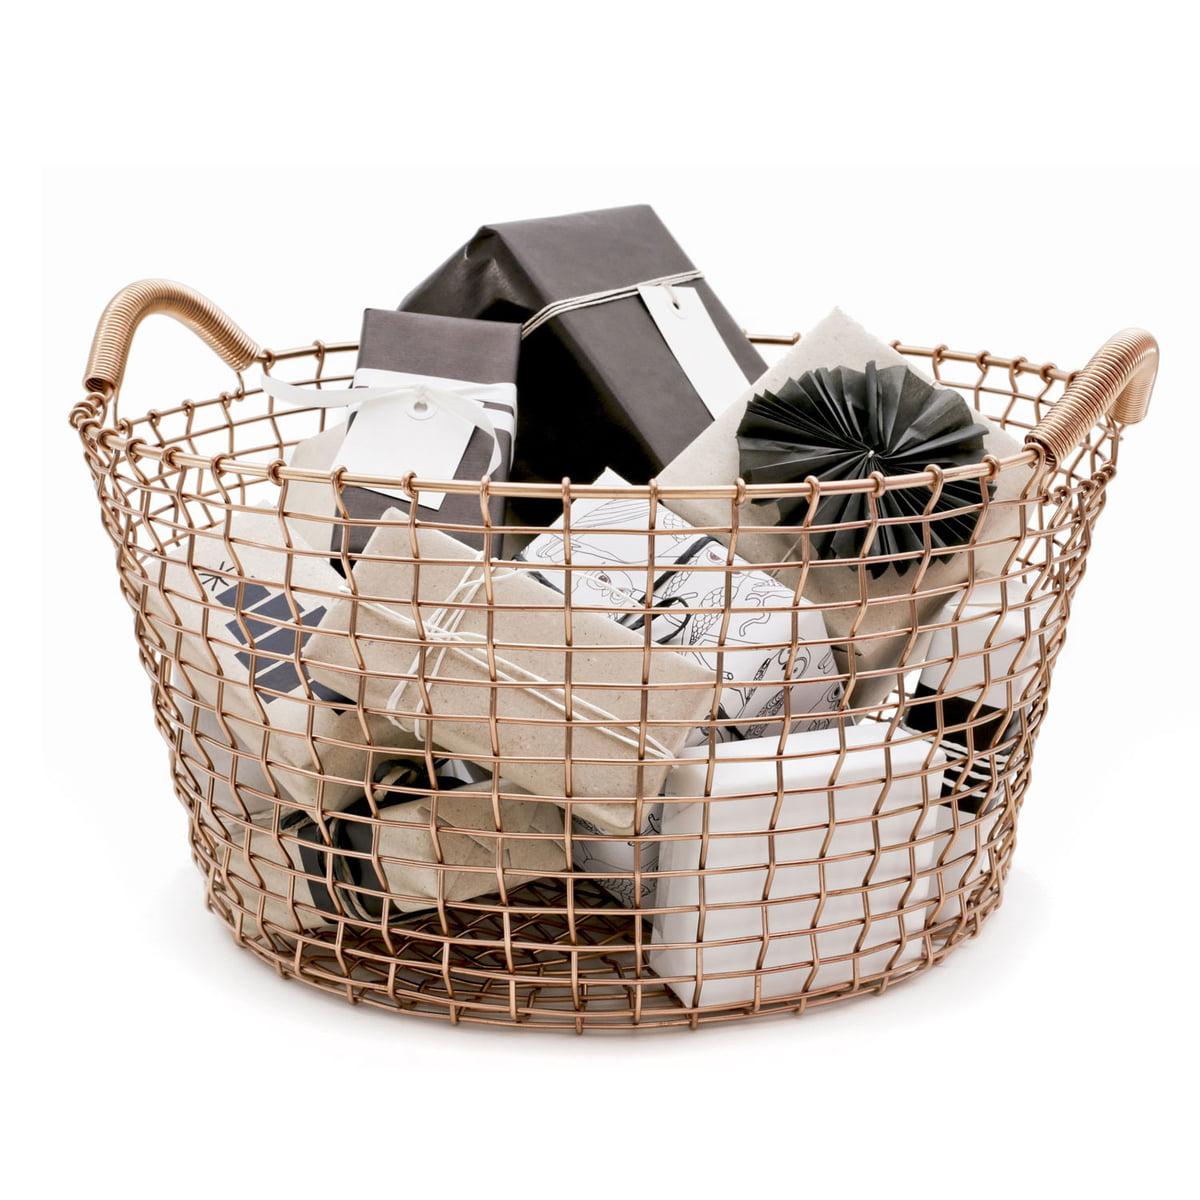 classic 35 von korbo im shop. Black Bedroom Furniture Sets. Home Design Ideas